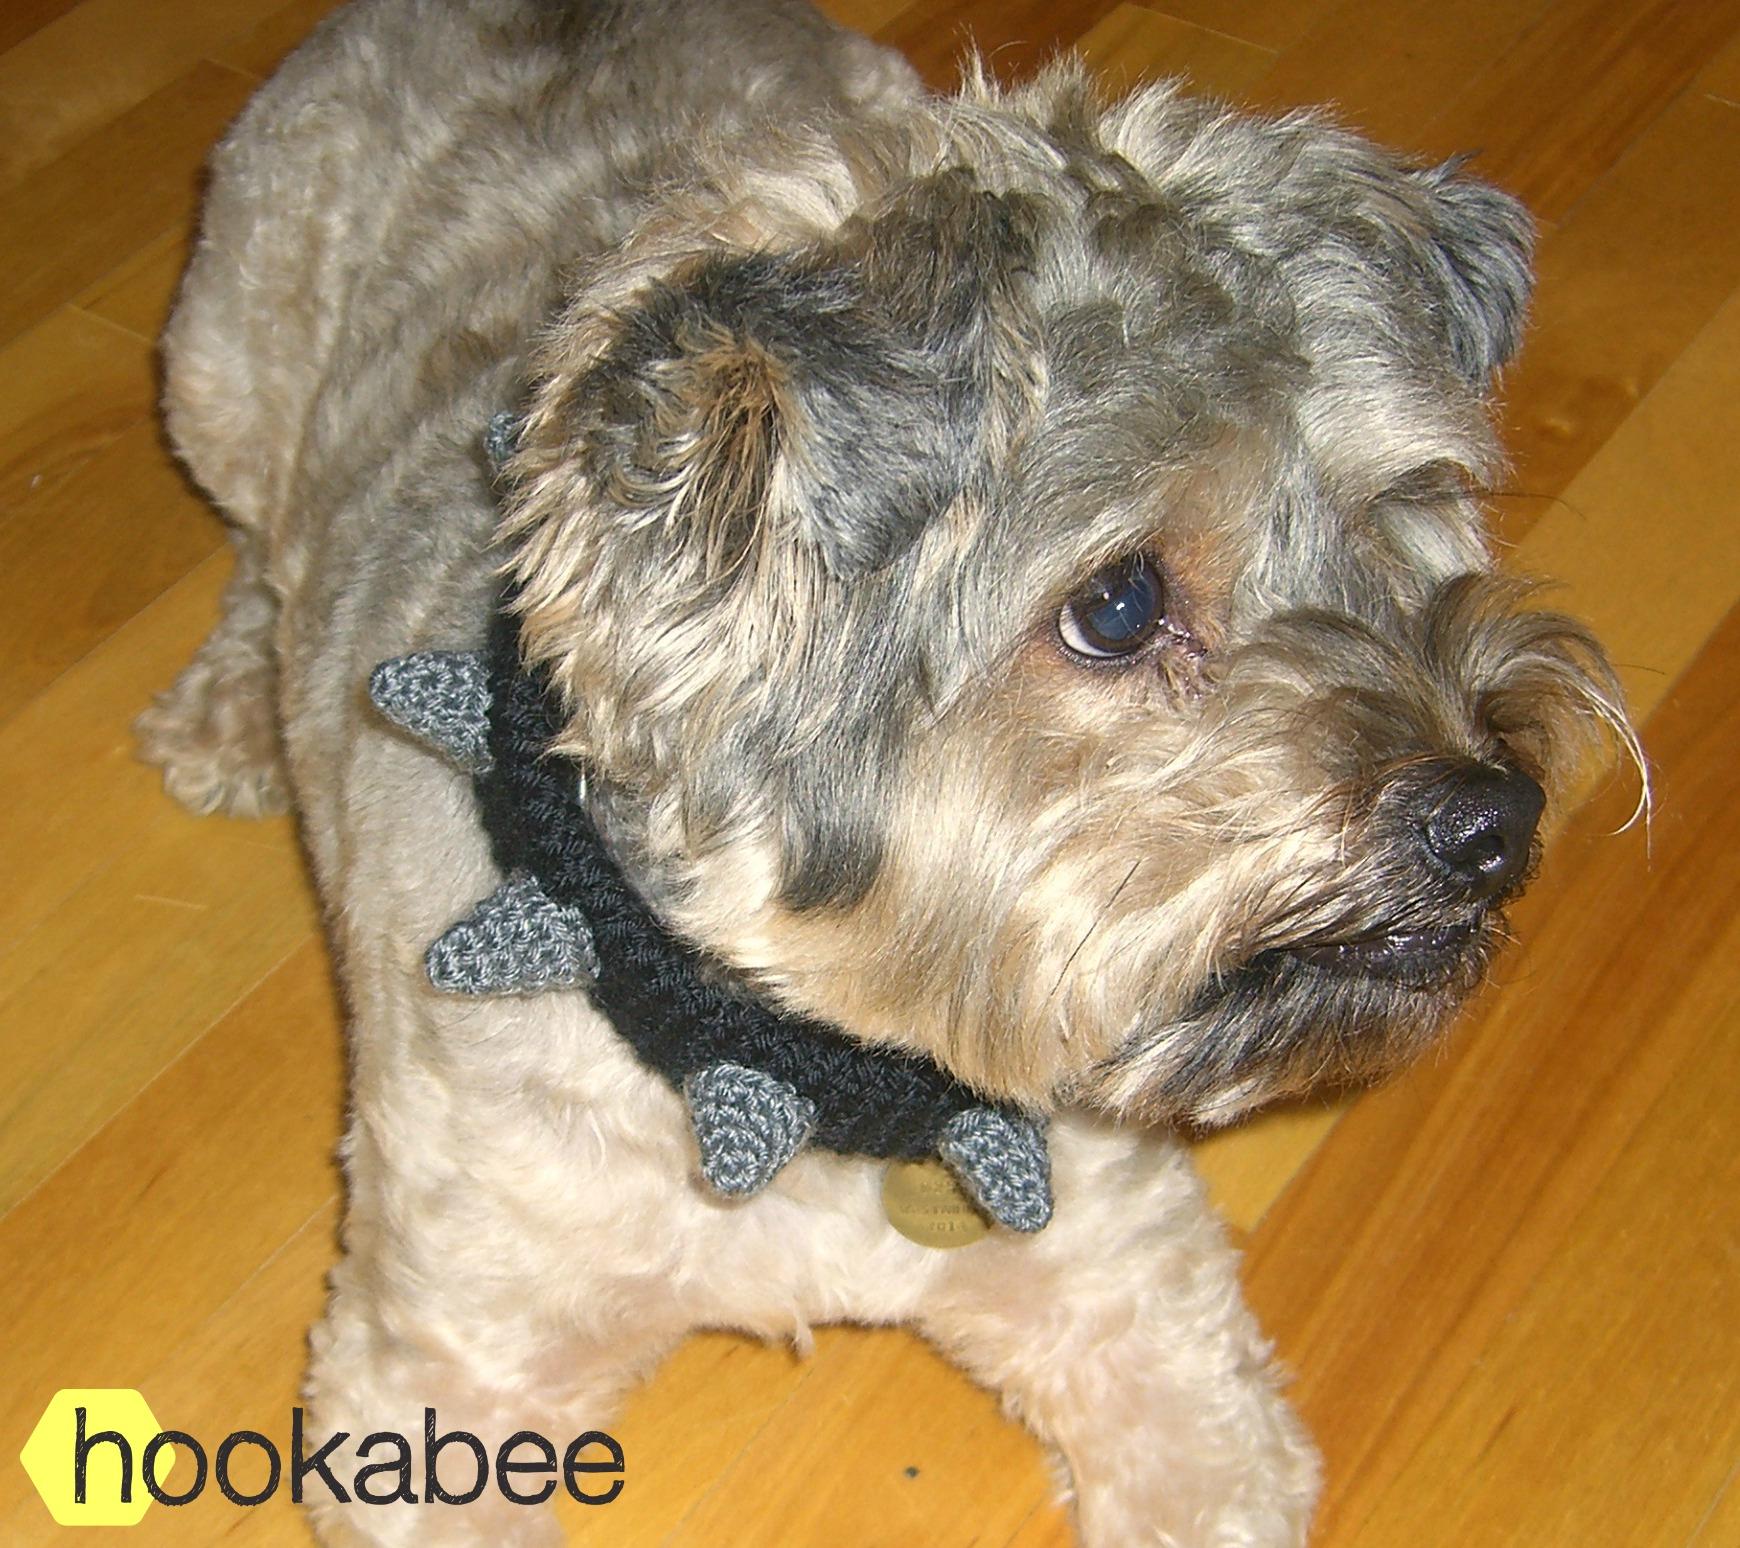 Spiked dog collar free pattern hookabee crochet spiked dog collar free pattern by hookabee crochet hookabee bankloansurffo Images